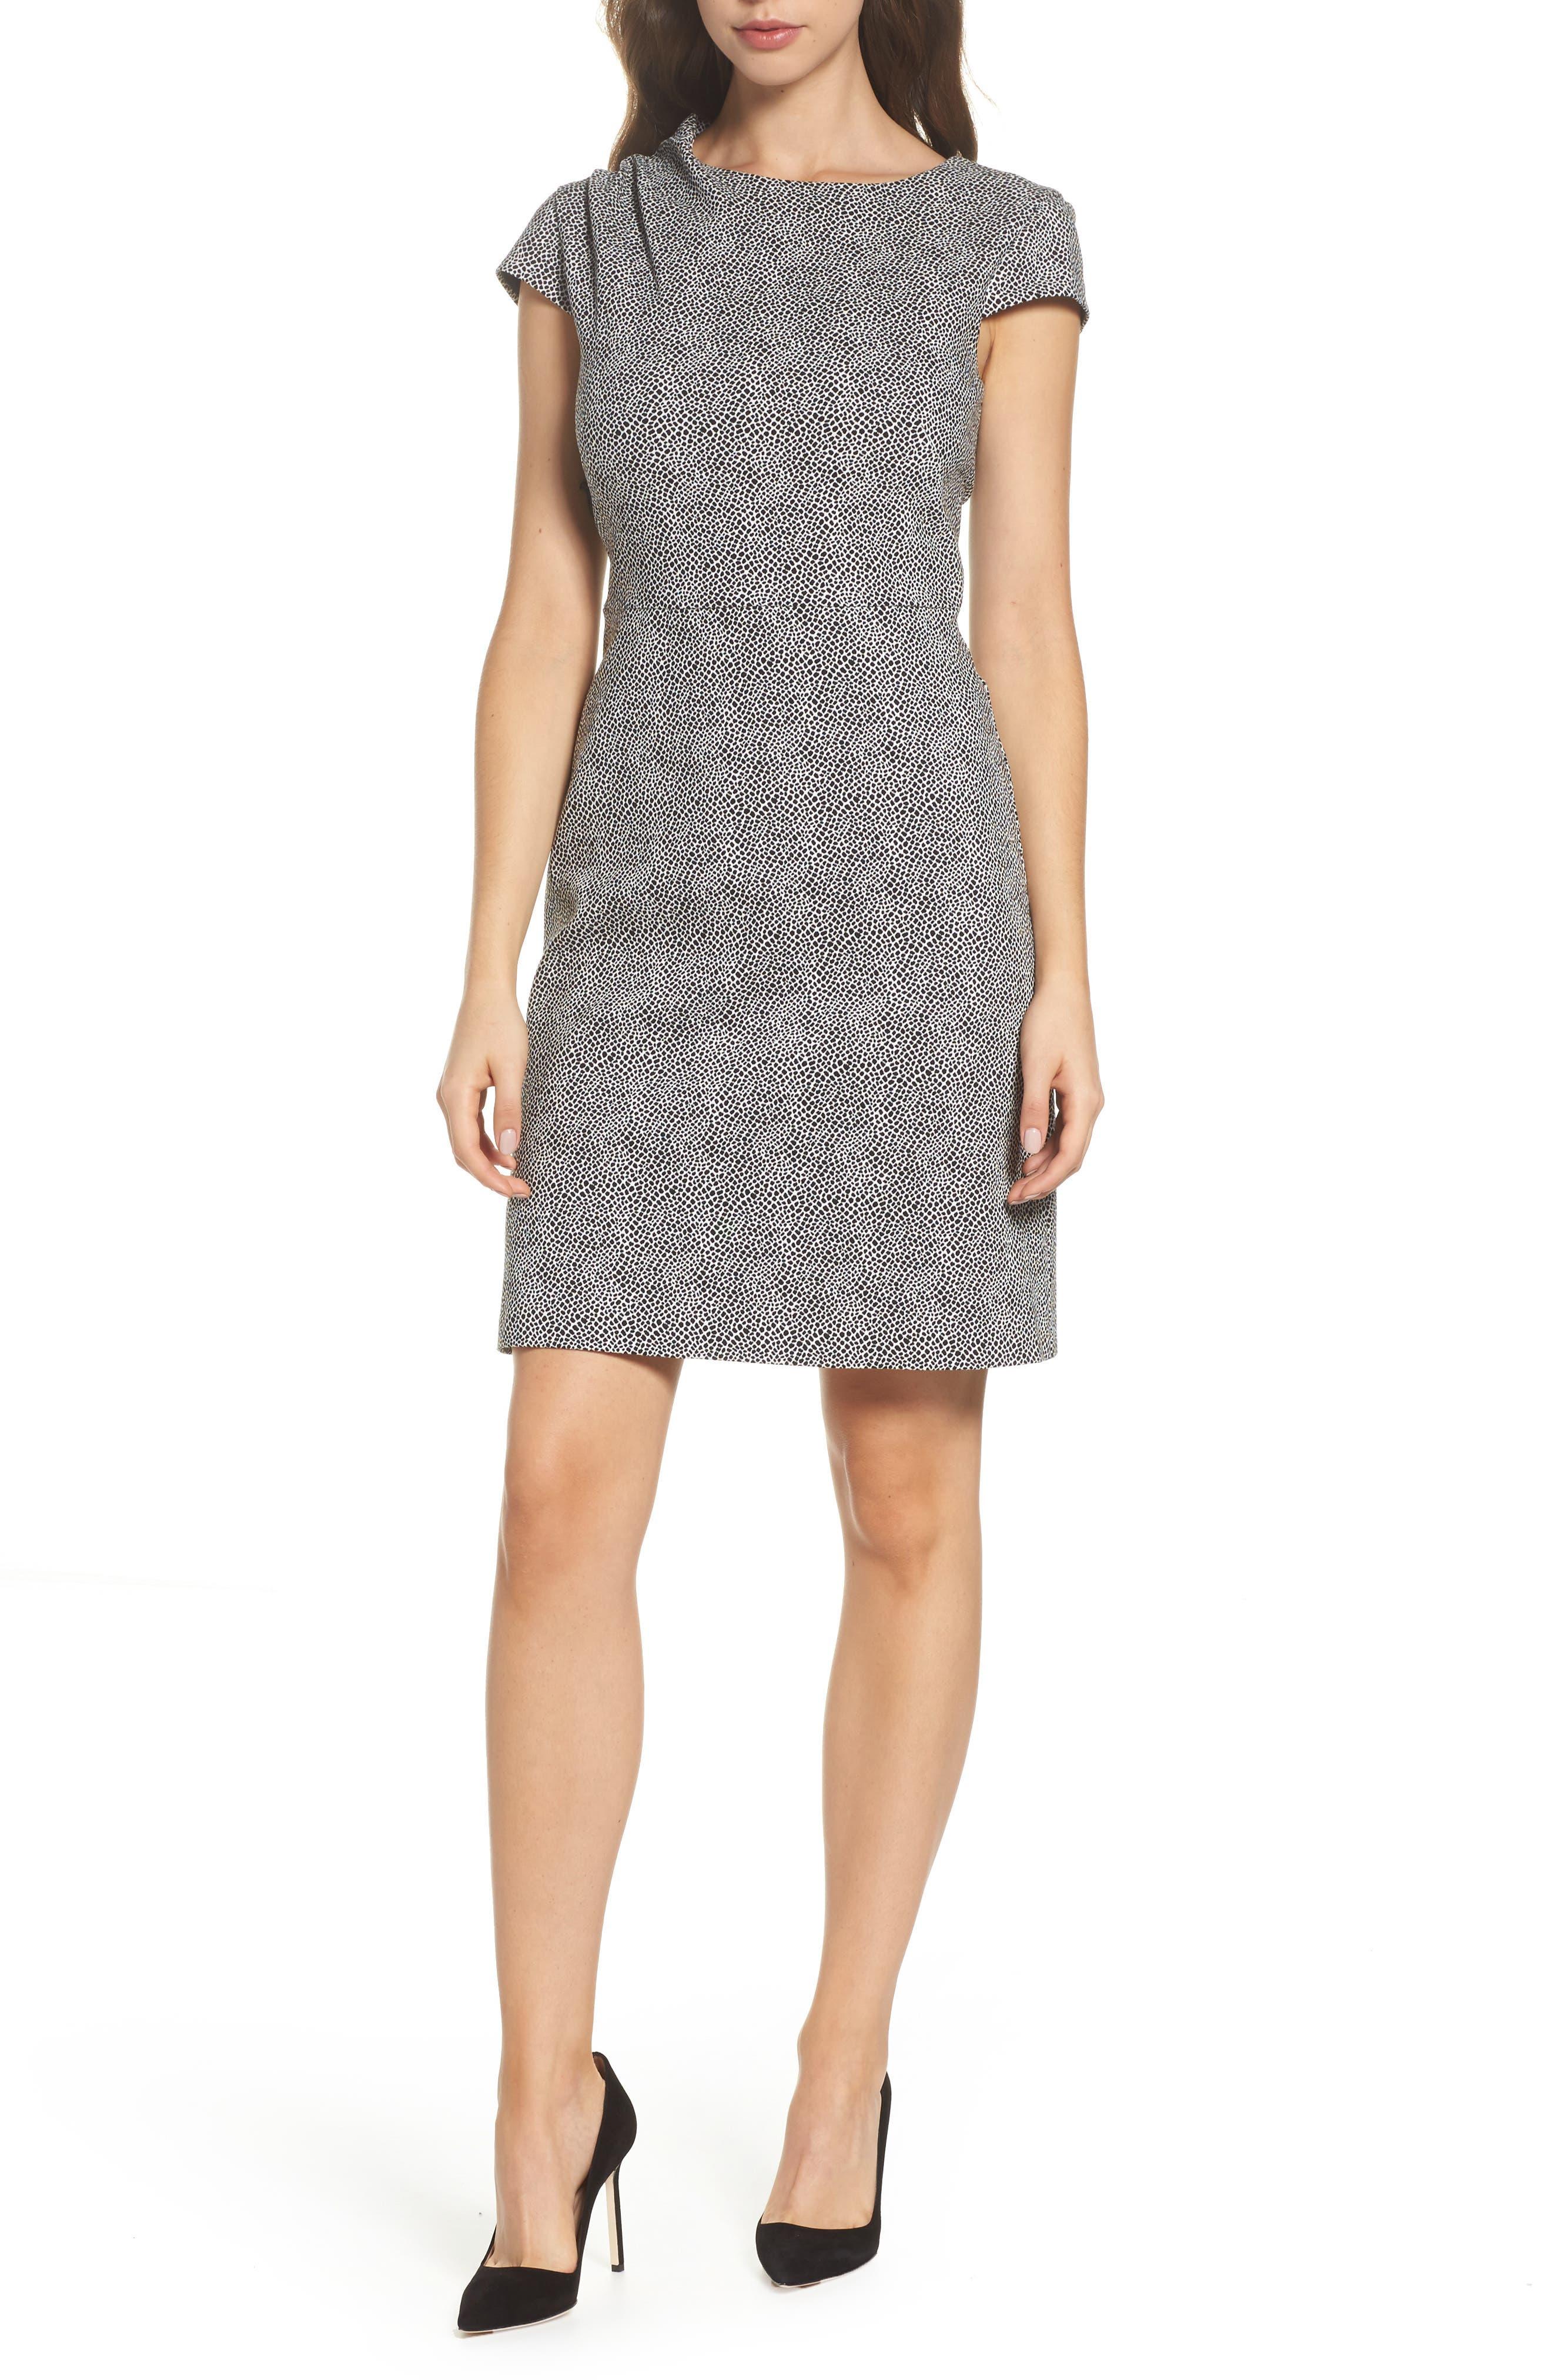 Jacquard Sheath Dress,                         Main,                         color, Ivory/ Black